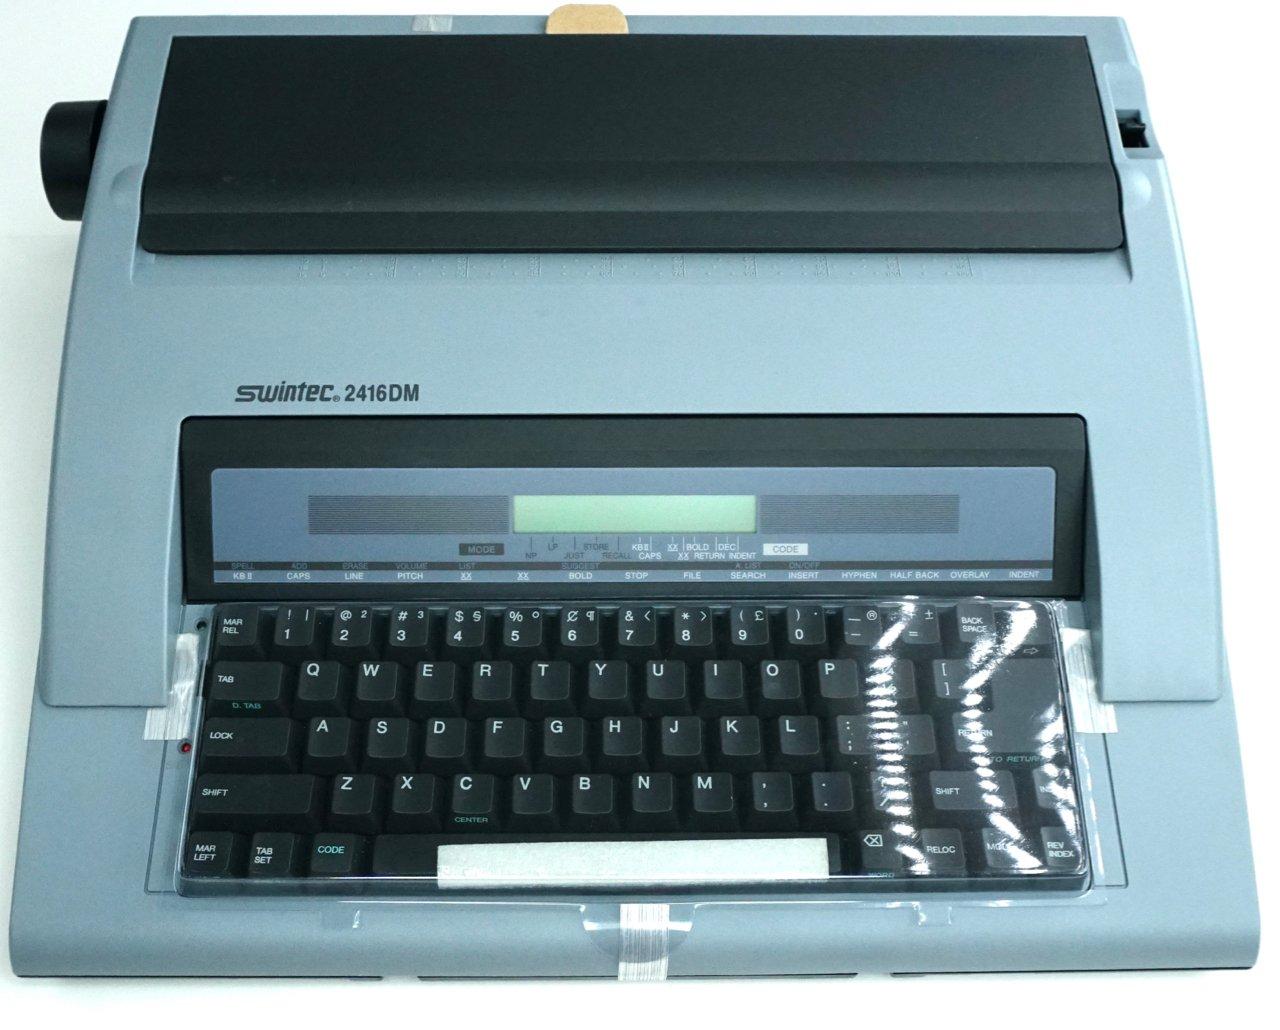 Brand New Swintec 2416DM Electronic Portable Typewriter (16K Memory) by Swintec